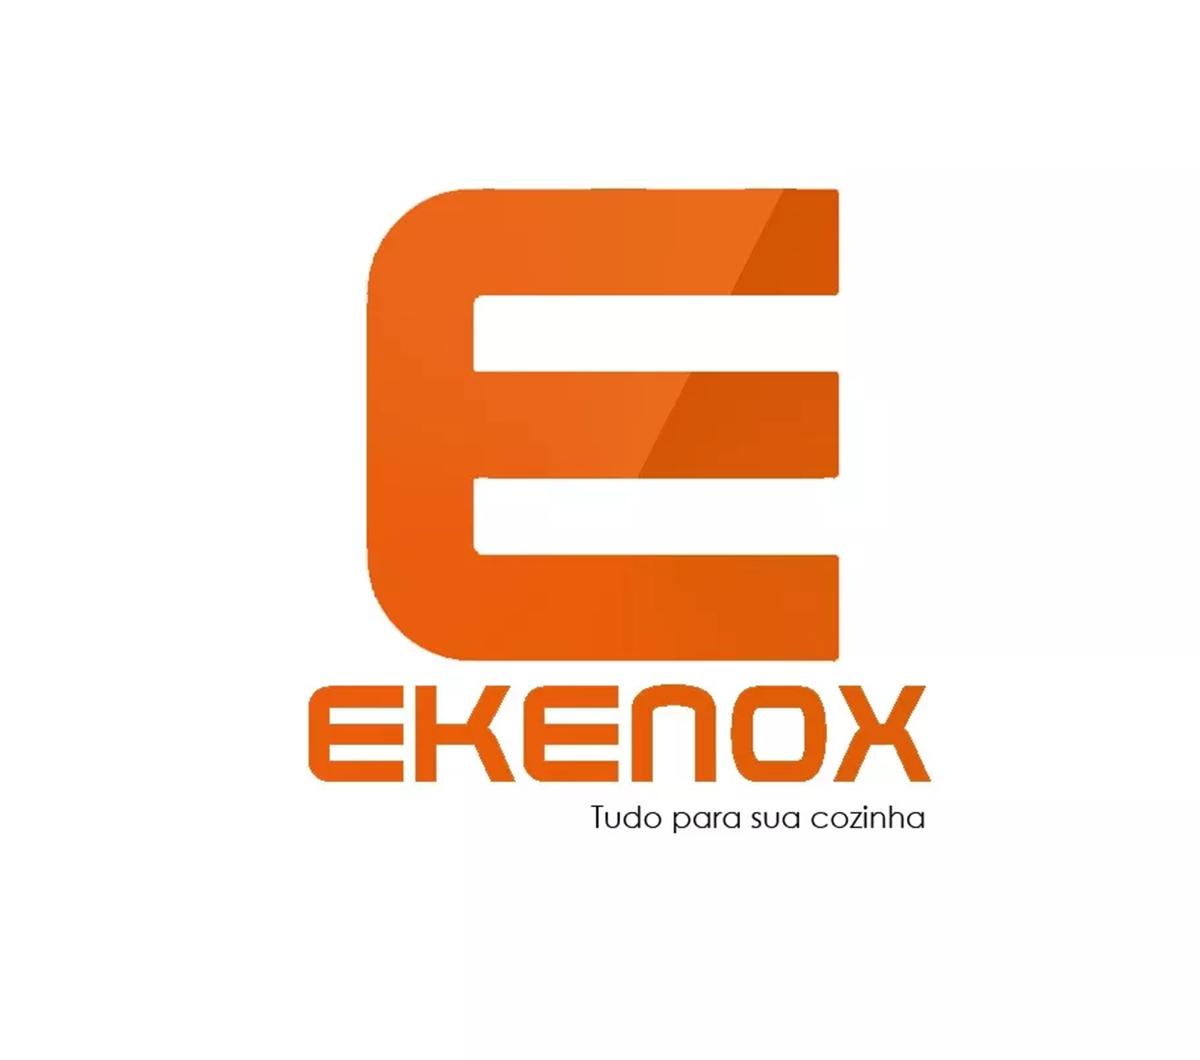 Kit 6 Unidades Gelo X Artificial Reutilizável Gel 500ml  - EKENOX- Equipamentos Industriais